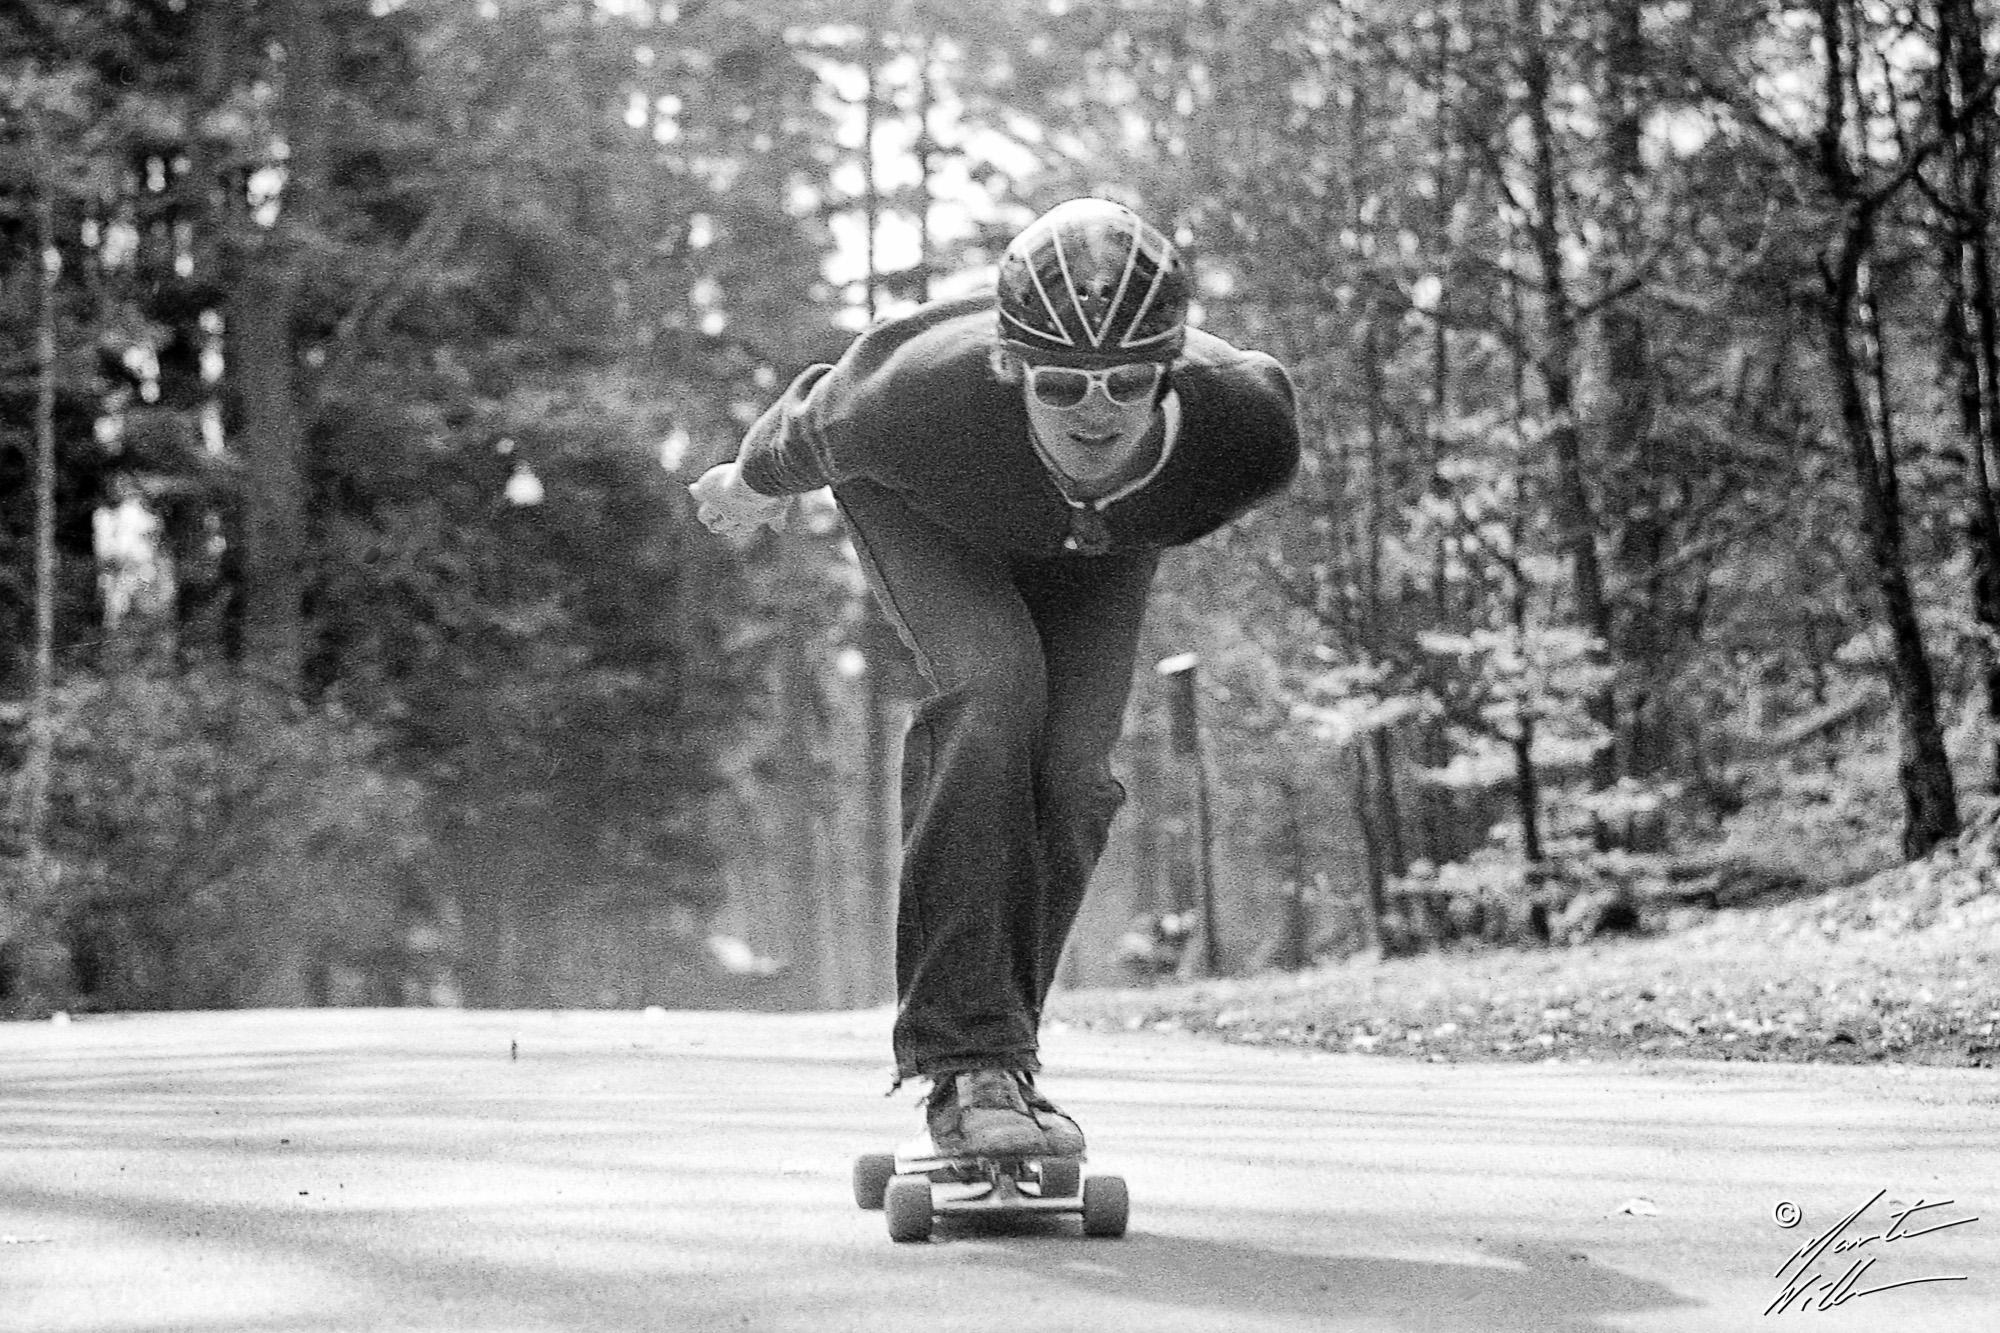 Philip Willners, Downhill,  Jönköping 1982